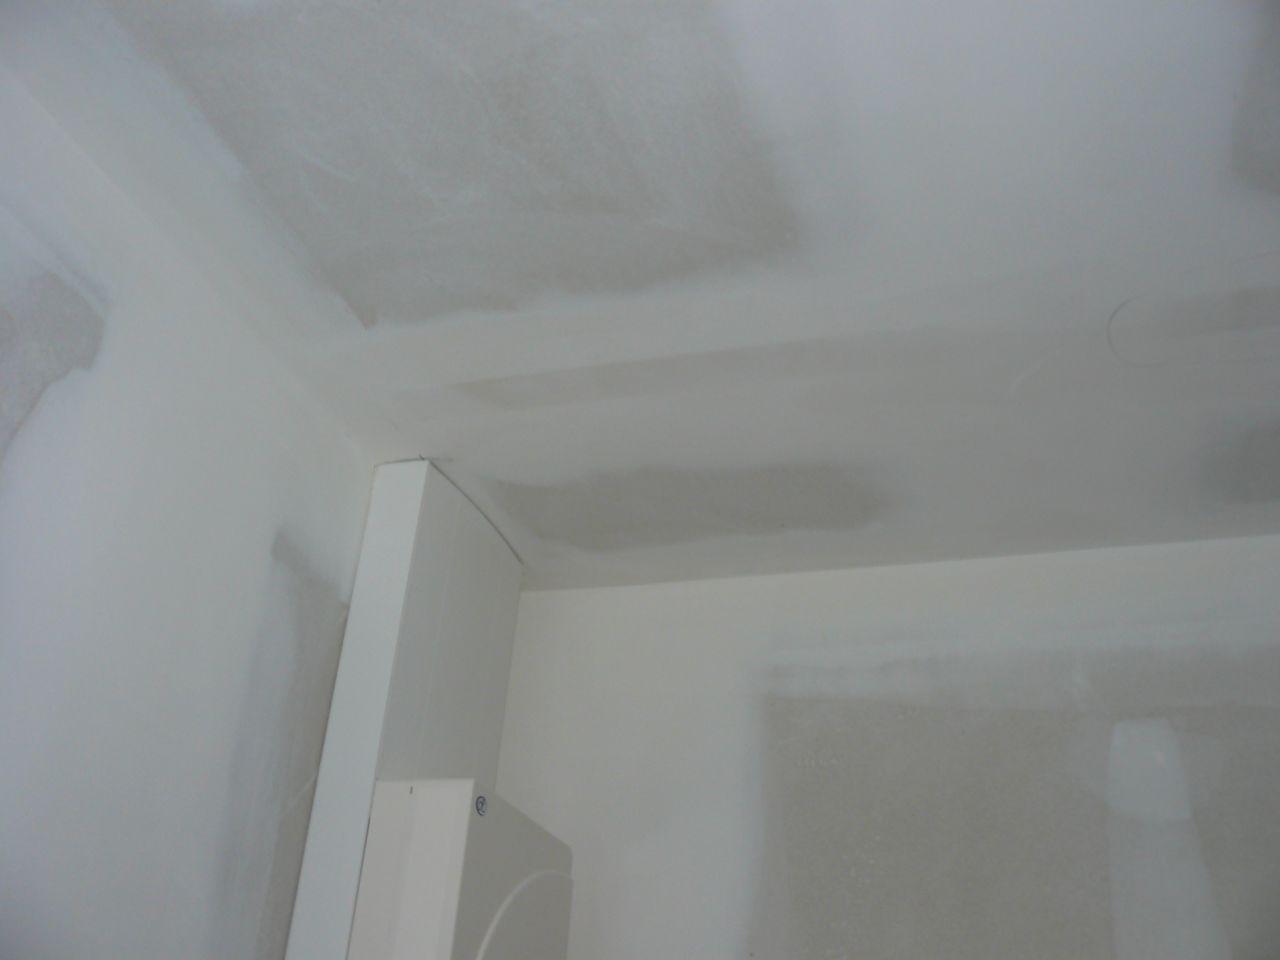 infiltrations plafond que doit on demander refaire 12 messages. Black Bedroom Furniture Sets. Home Design Ideas